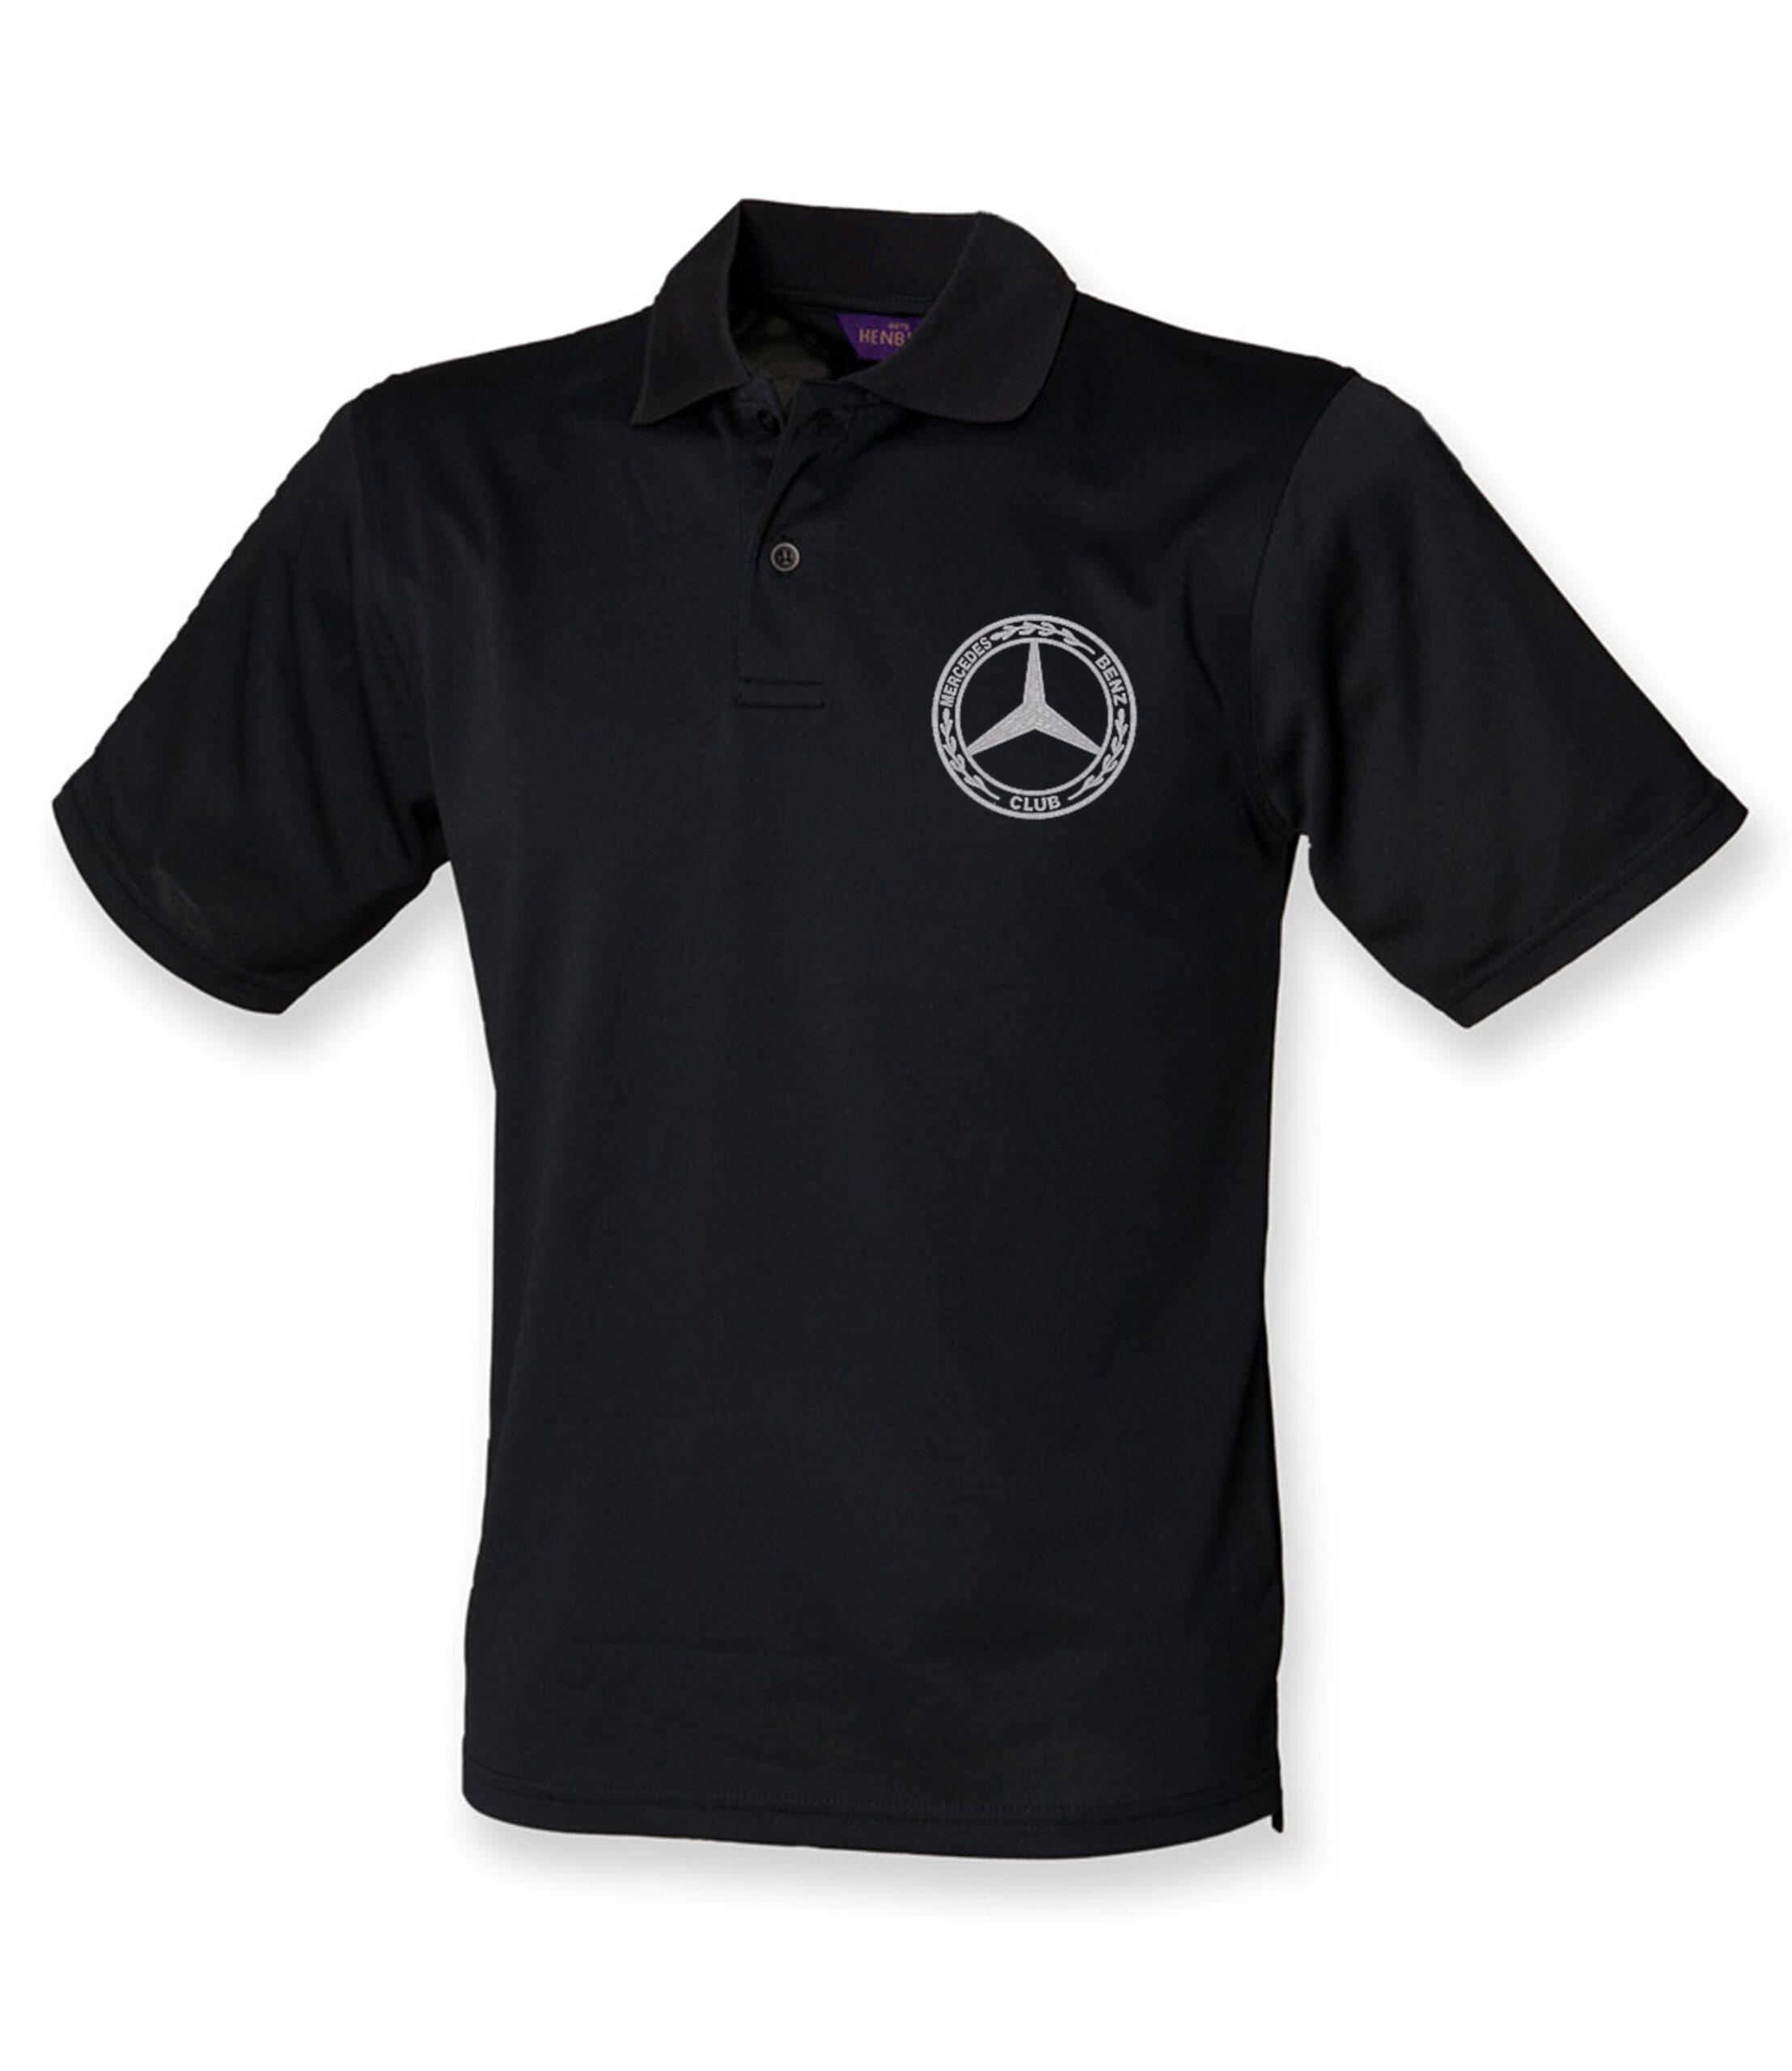 Mercedes-Benz Club Wicking Pique Polo Shirt Black